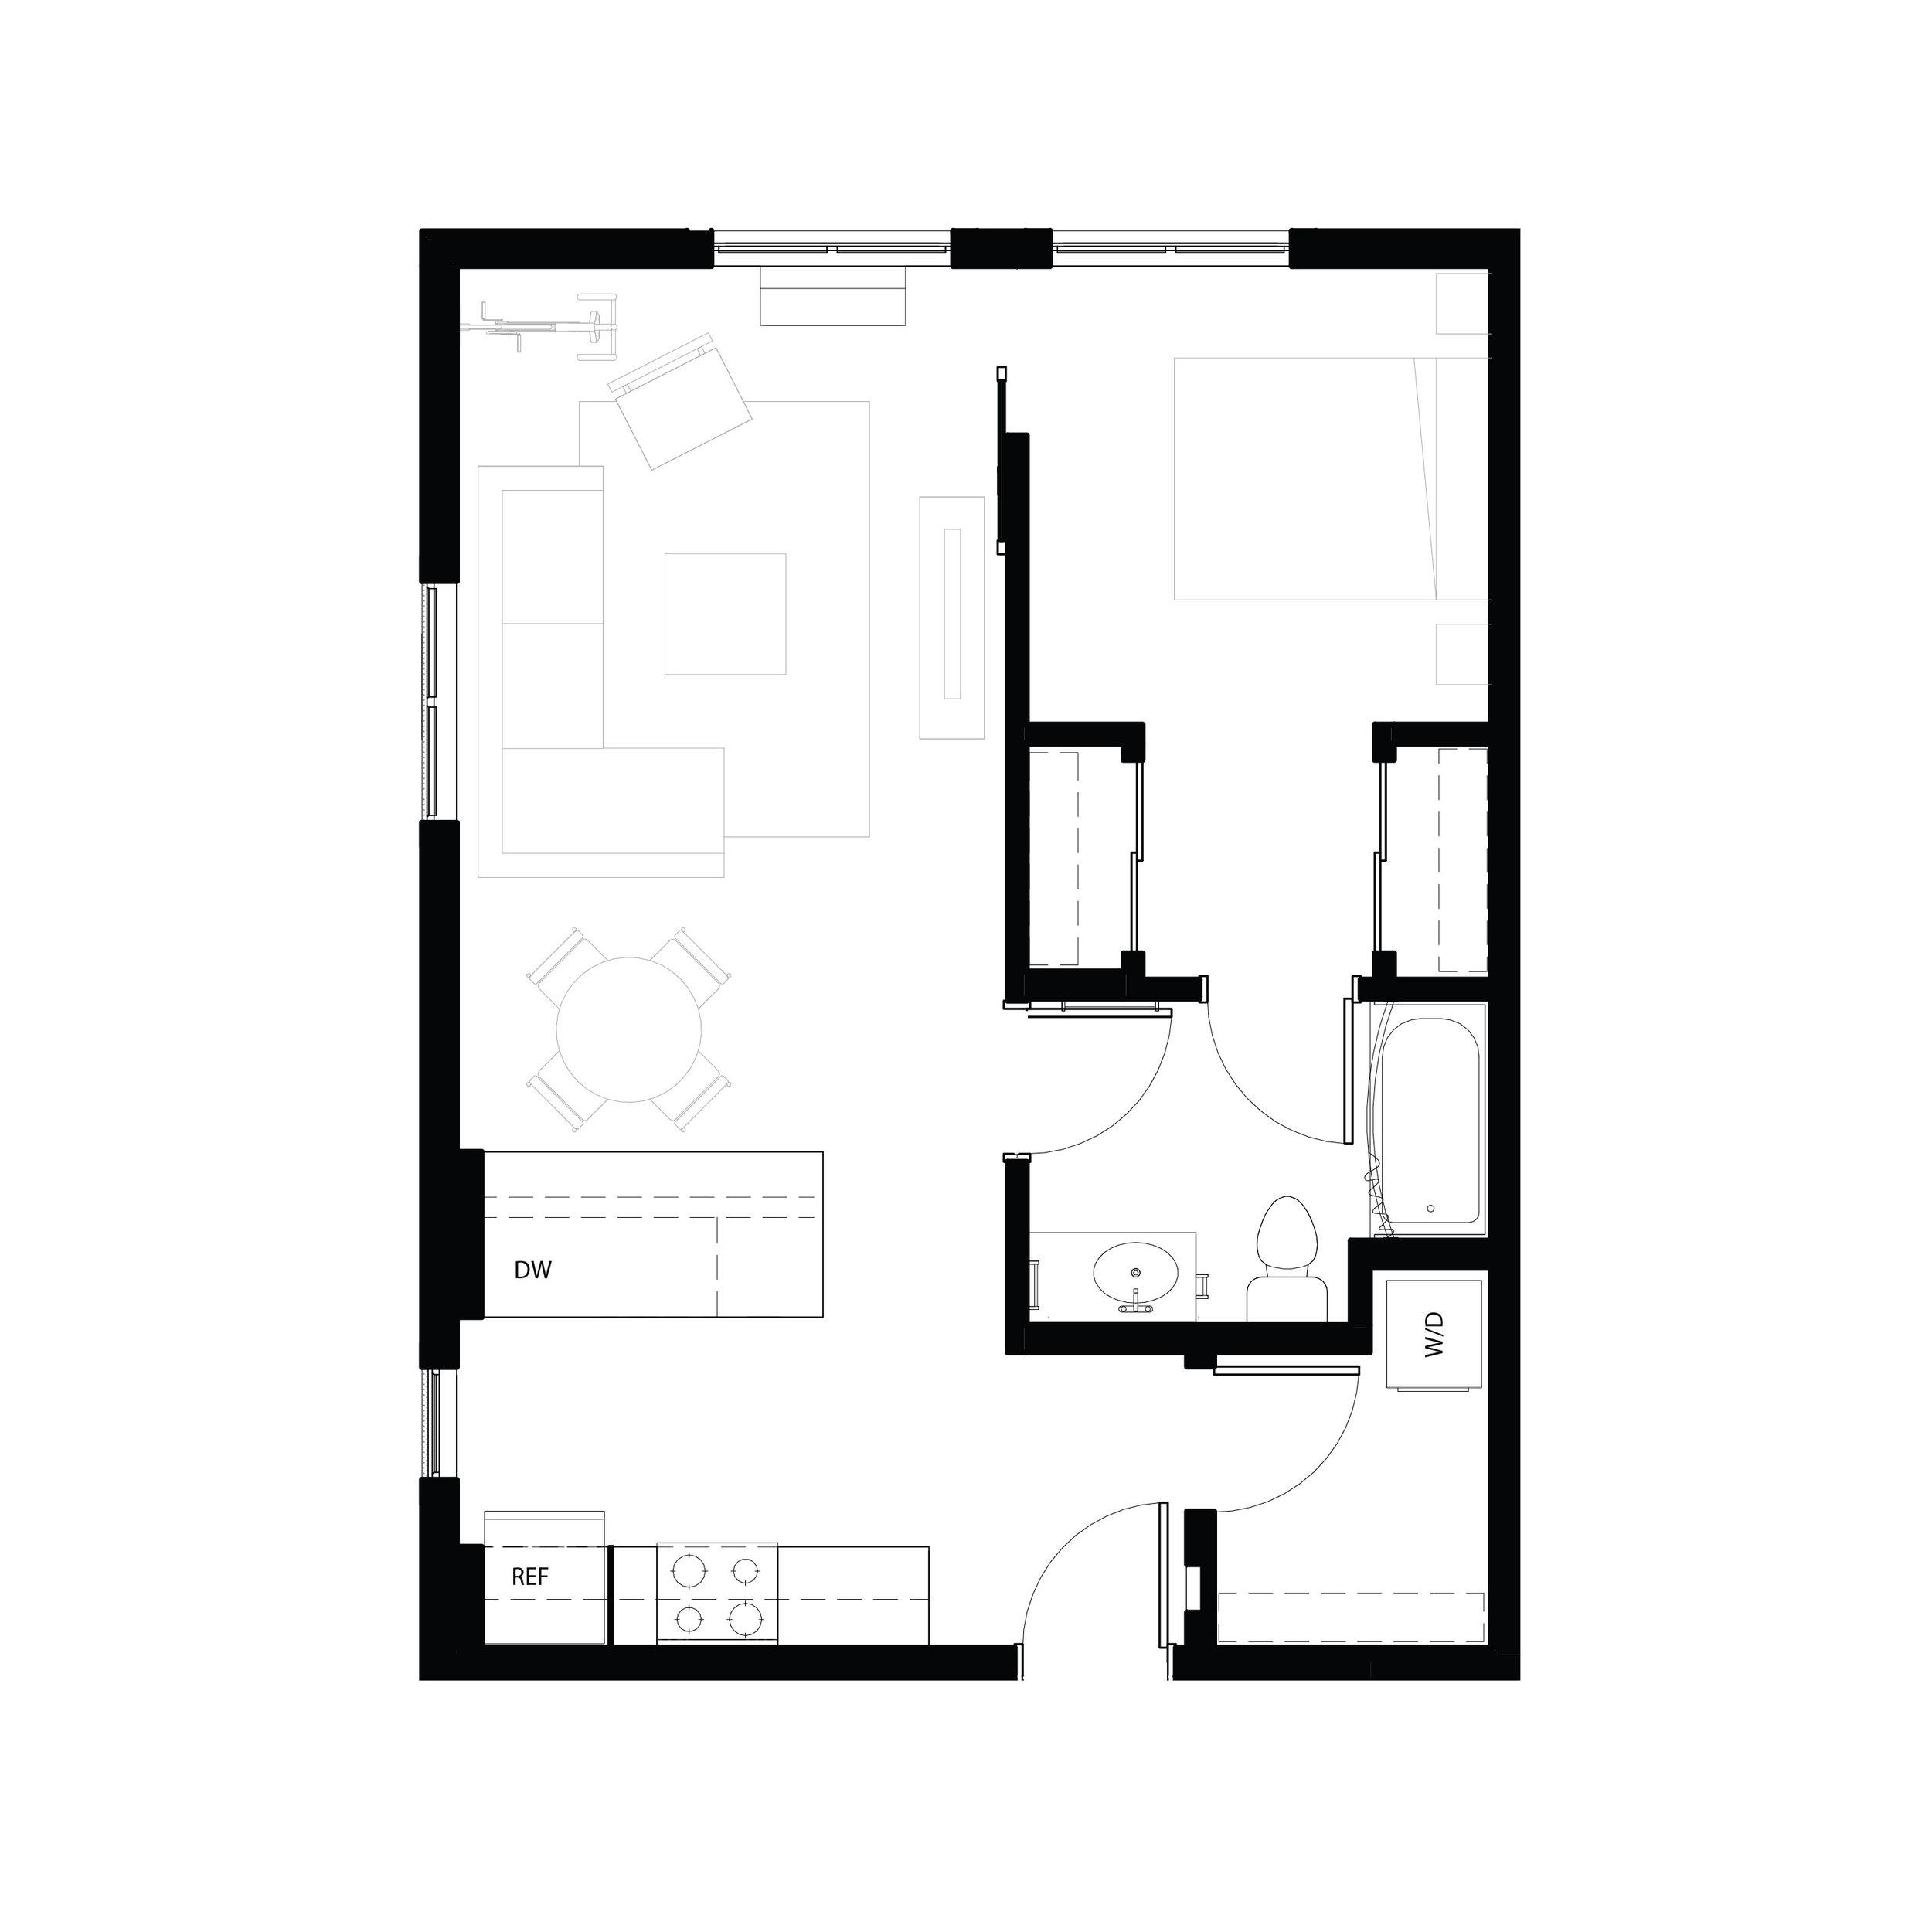 One bedroom 670 sq ft